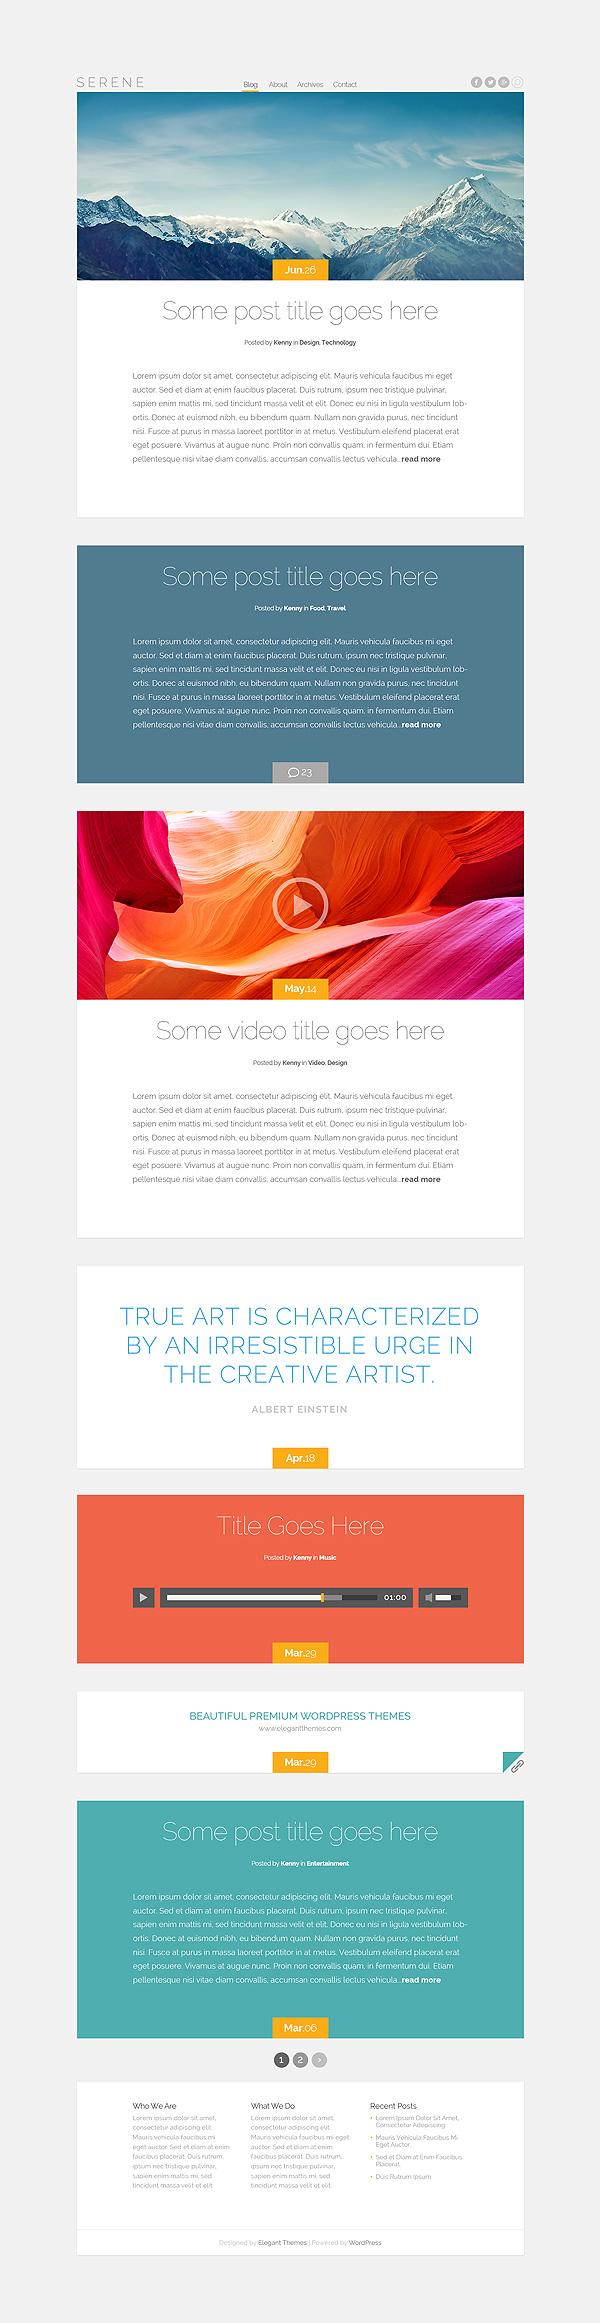 Serene - WordPress šablona od Elegant Themes zdarma